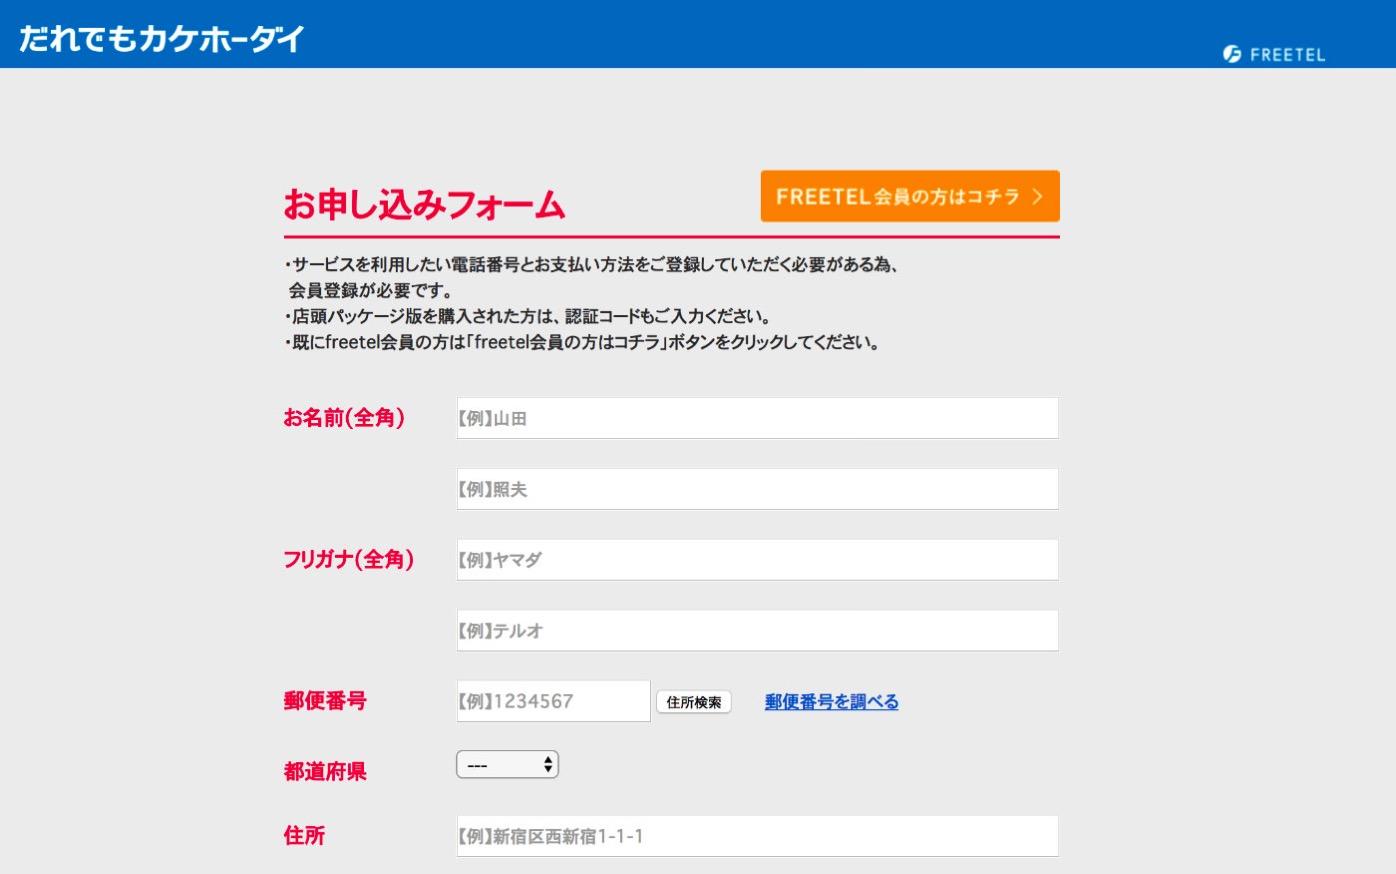 「FREETEL 電話だれでもカケホーダイ」-2